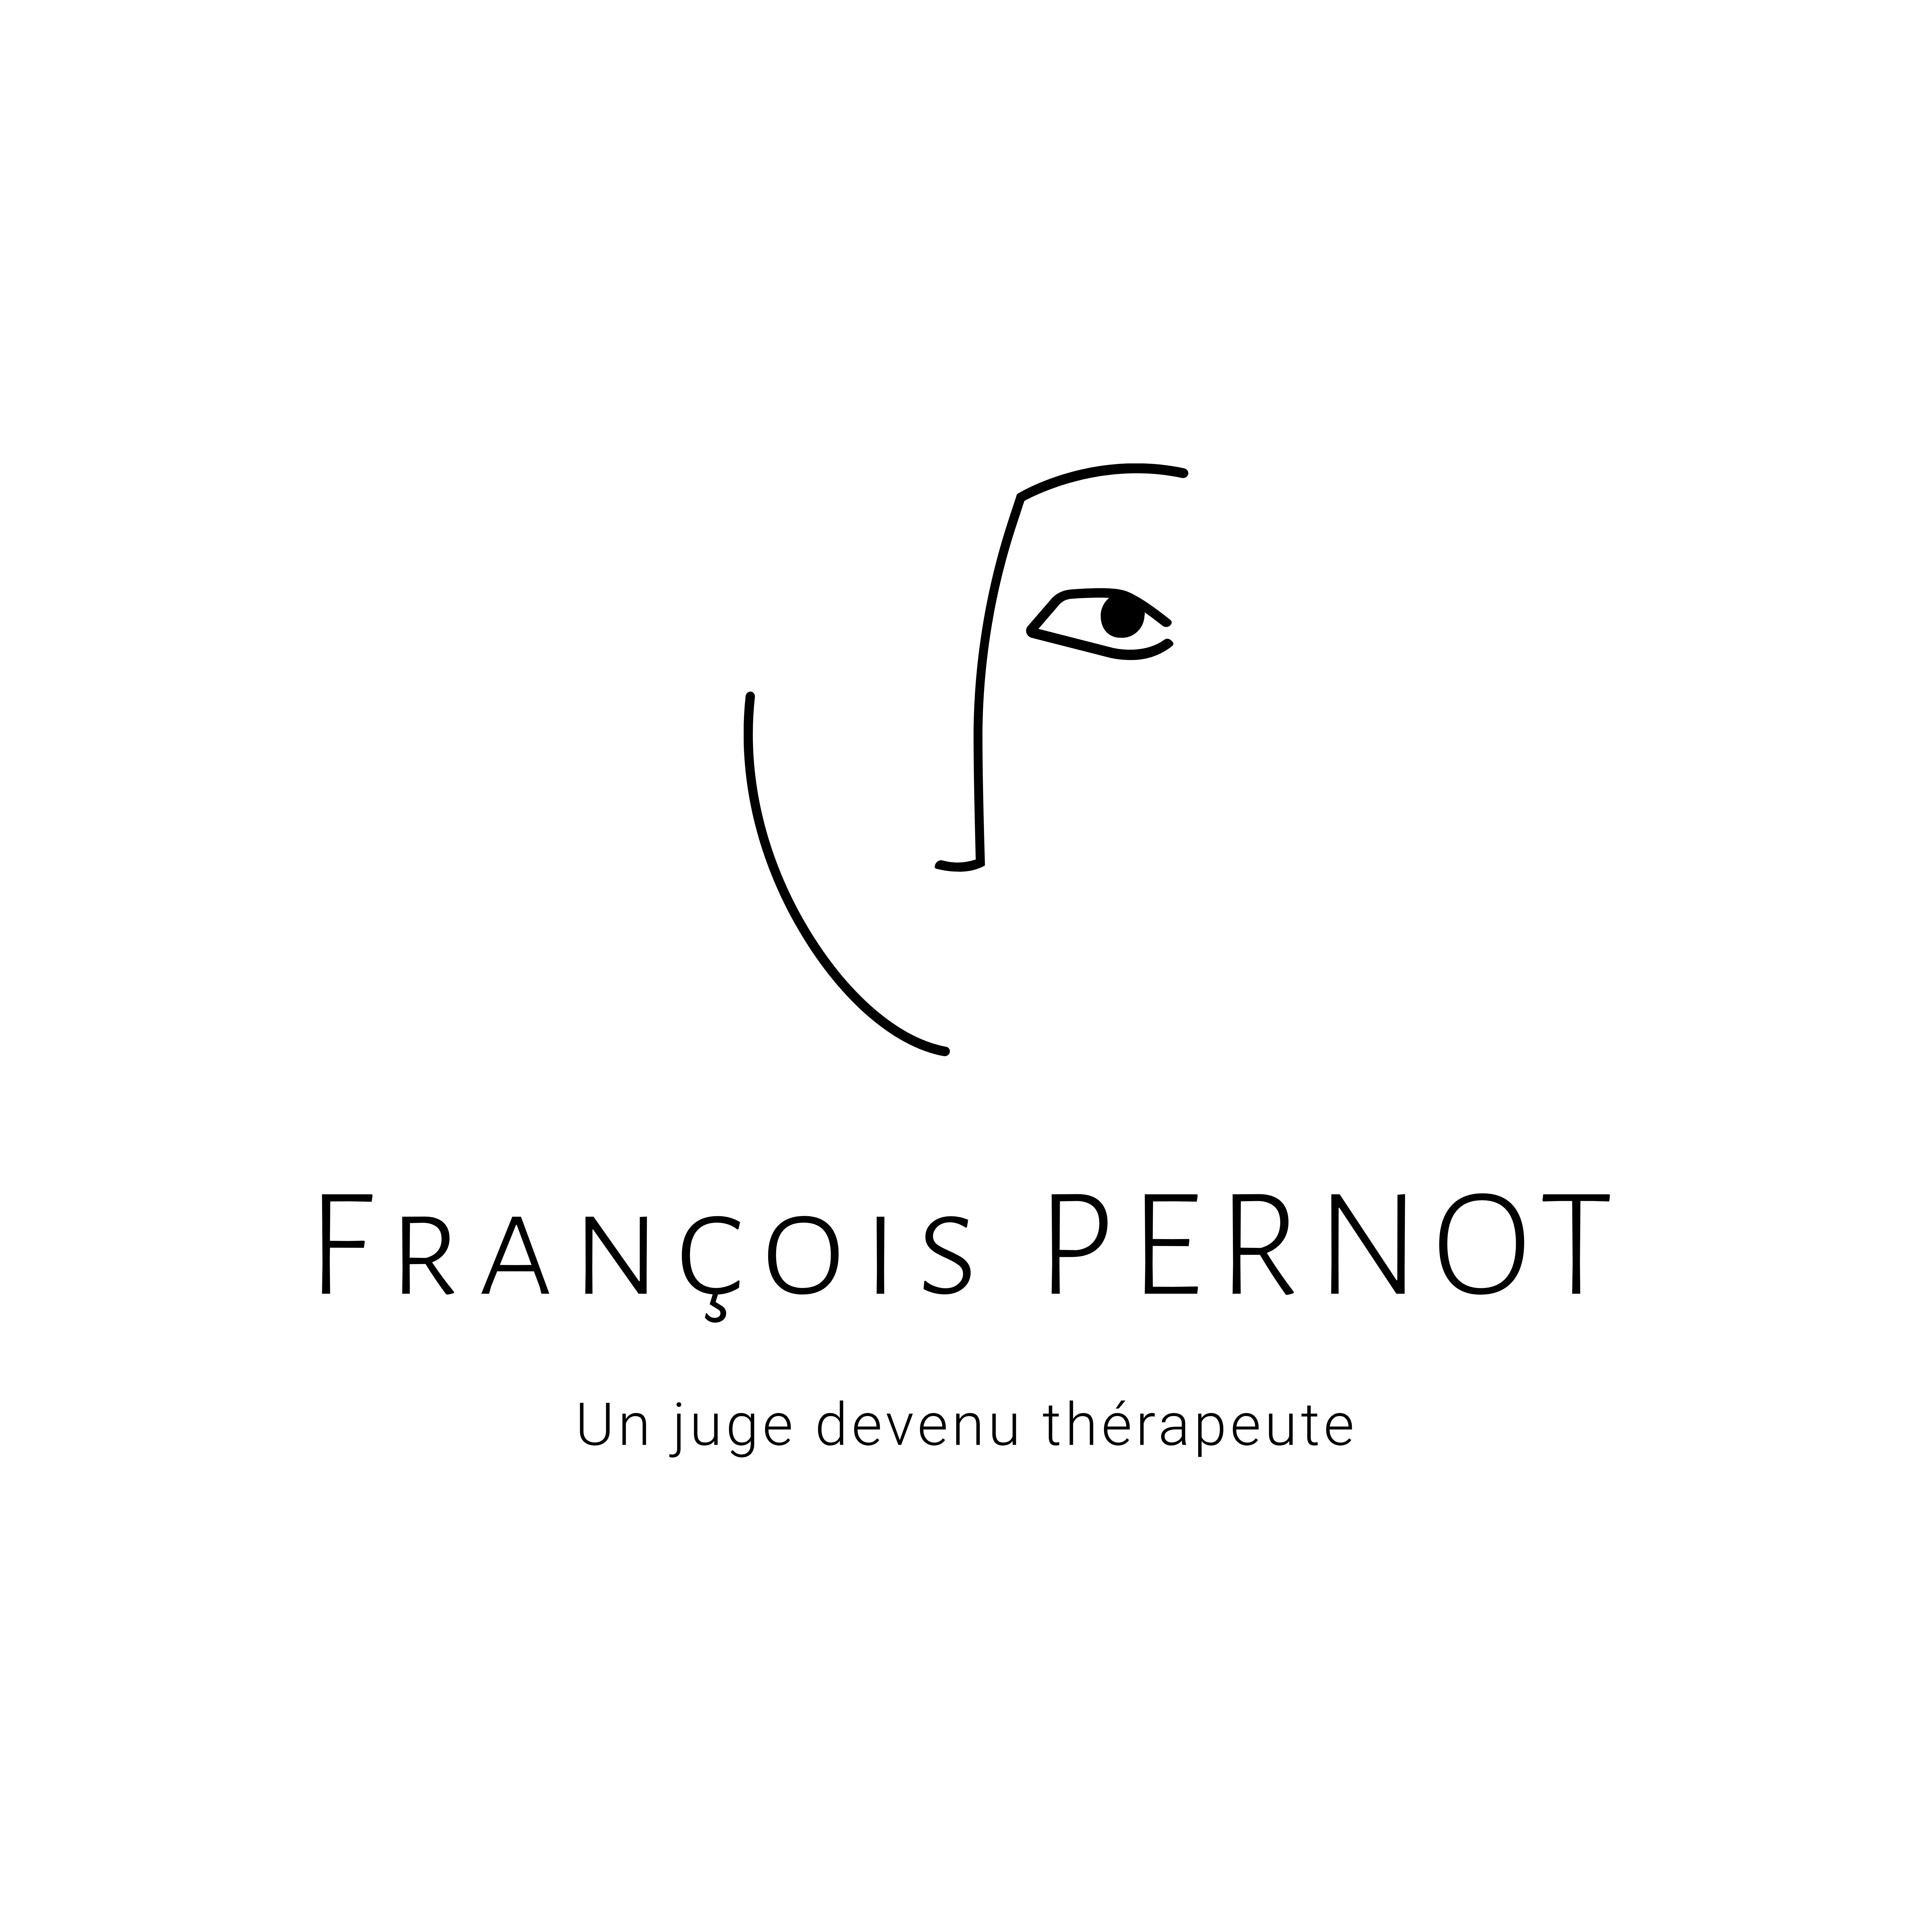 François PERNOT